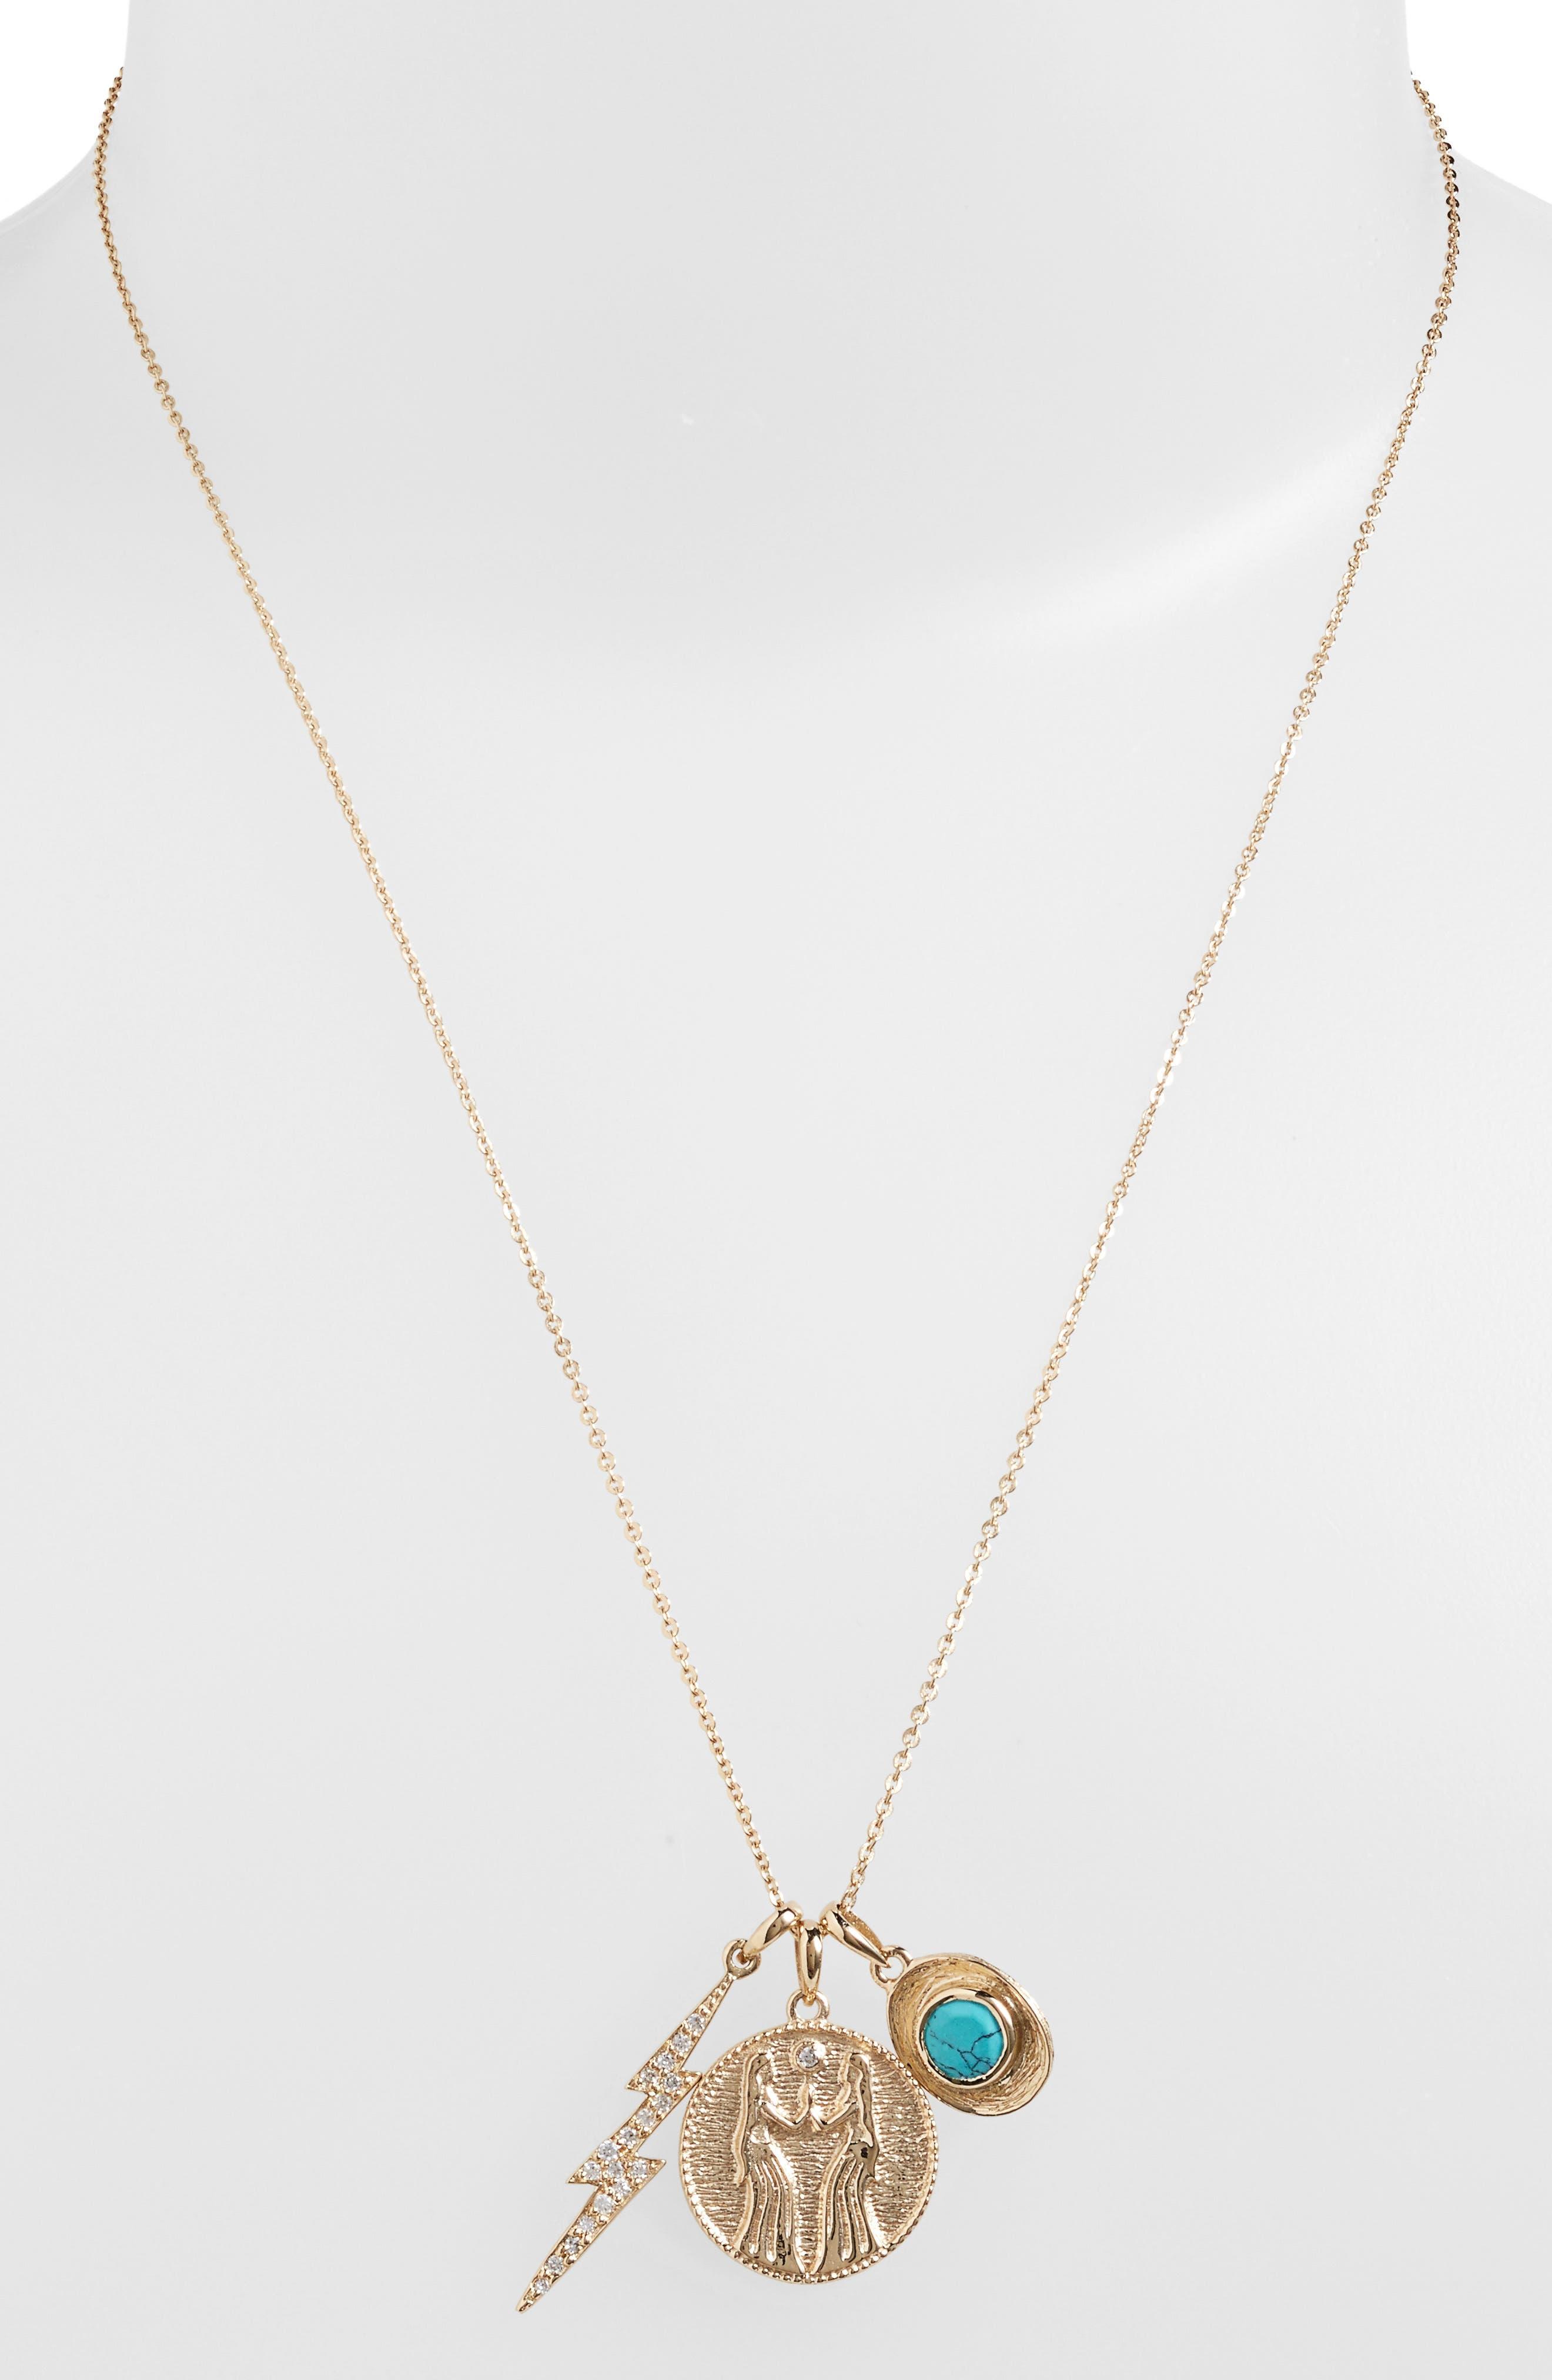 Goddess of Sisterhood Pendant Necklace,                             Alternate thumbnail 2, color,                             Turquoise/ Gold